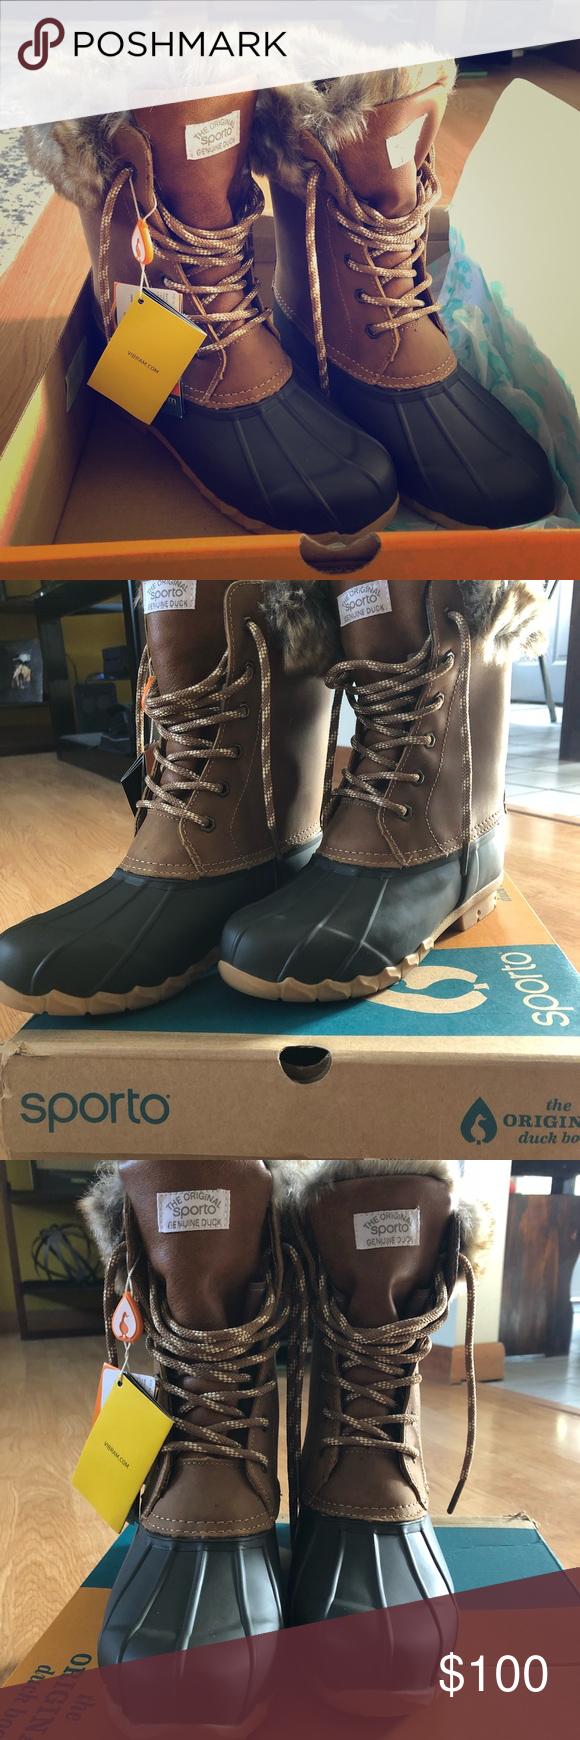 "ac08af0aee7 Sporto Original Duck Boots NIB Sporto ""Agnes"" fur-lined winter boots ..."